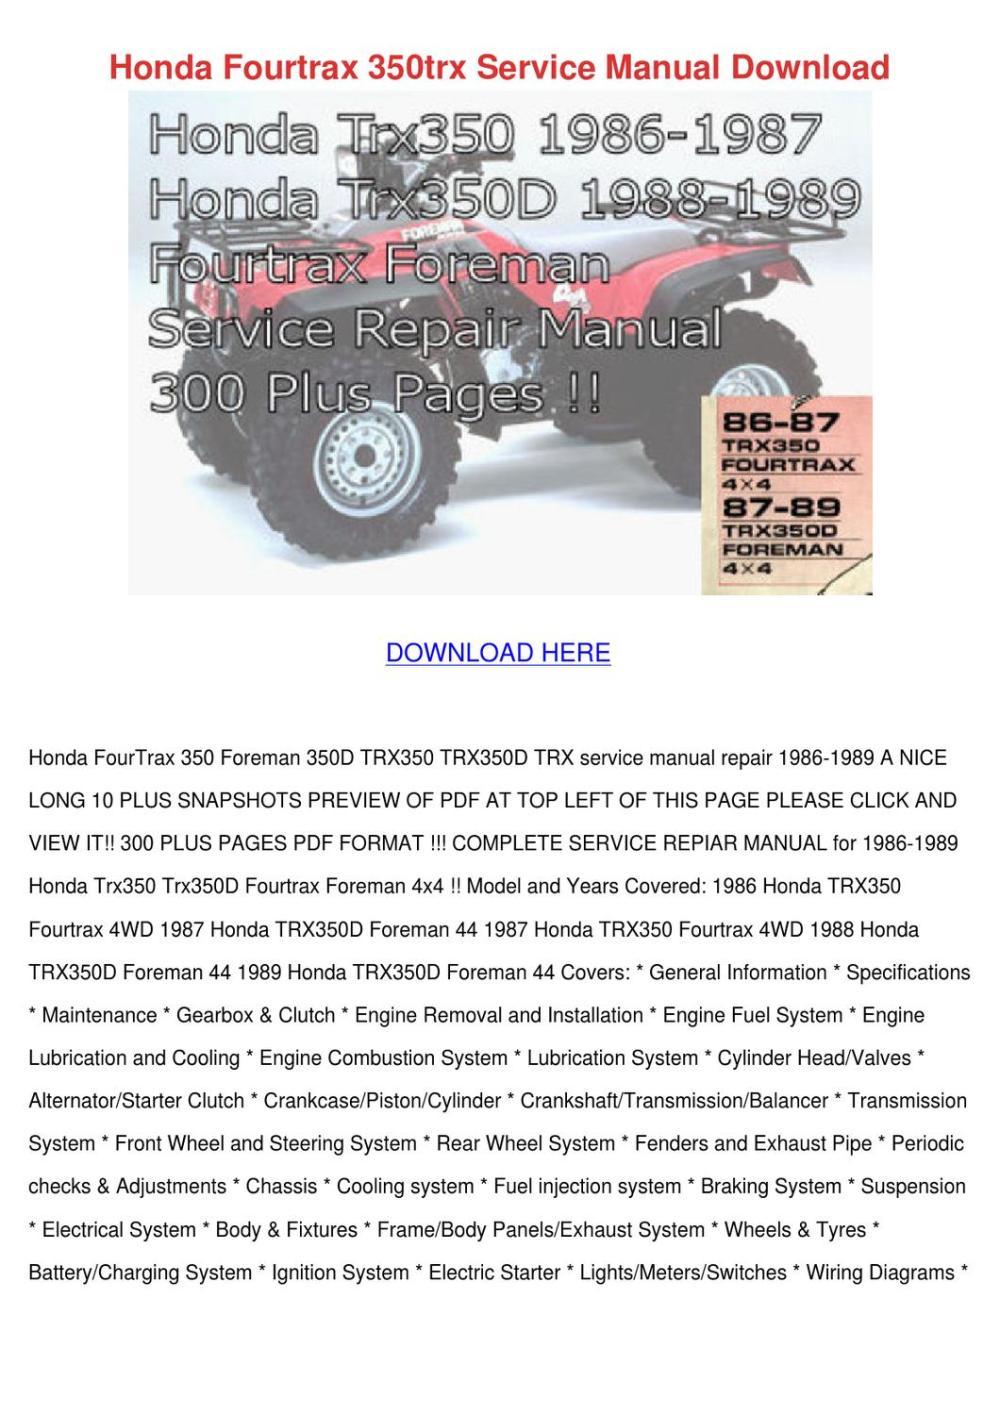 medium resolution of honda fourtrax 350trx service manual download by alise neveu issuu89 honda 350 fourtrax wiring diagram